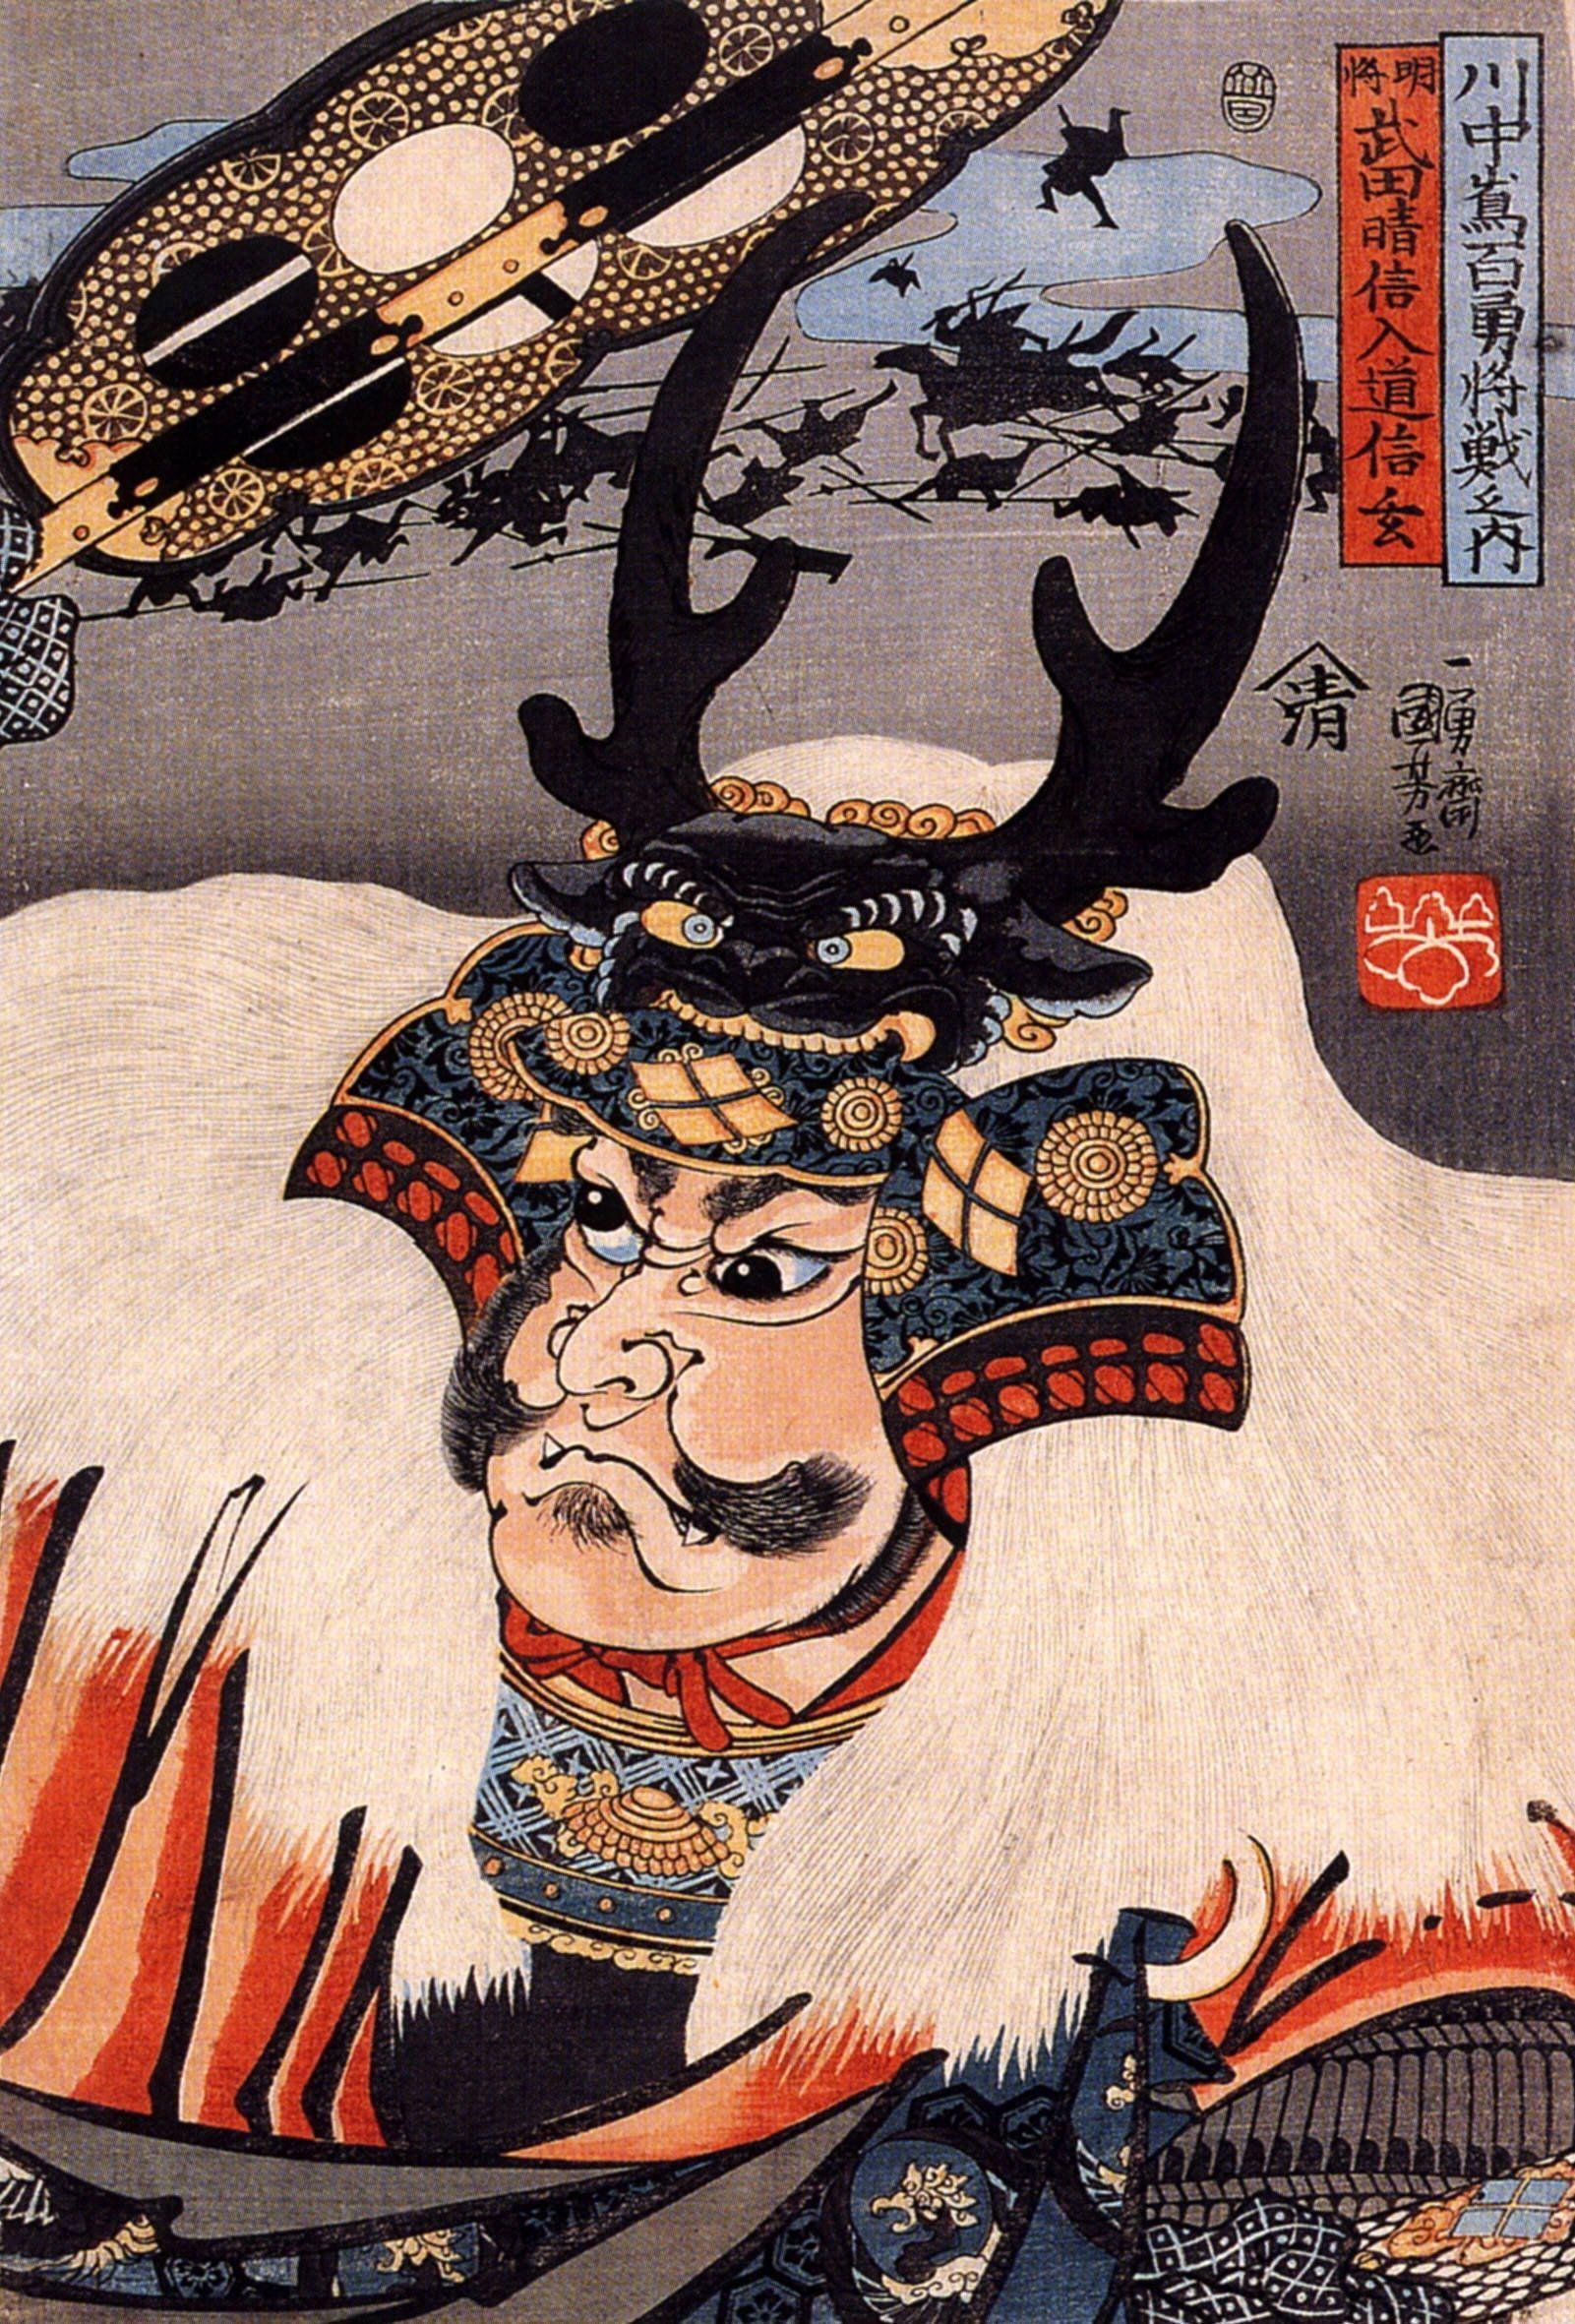 a biography of oda nobunaga a major daimyo in the sengoku period of japanese history